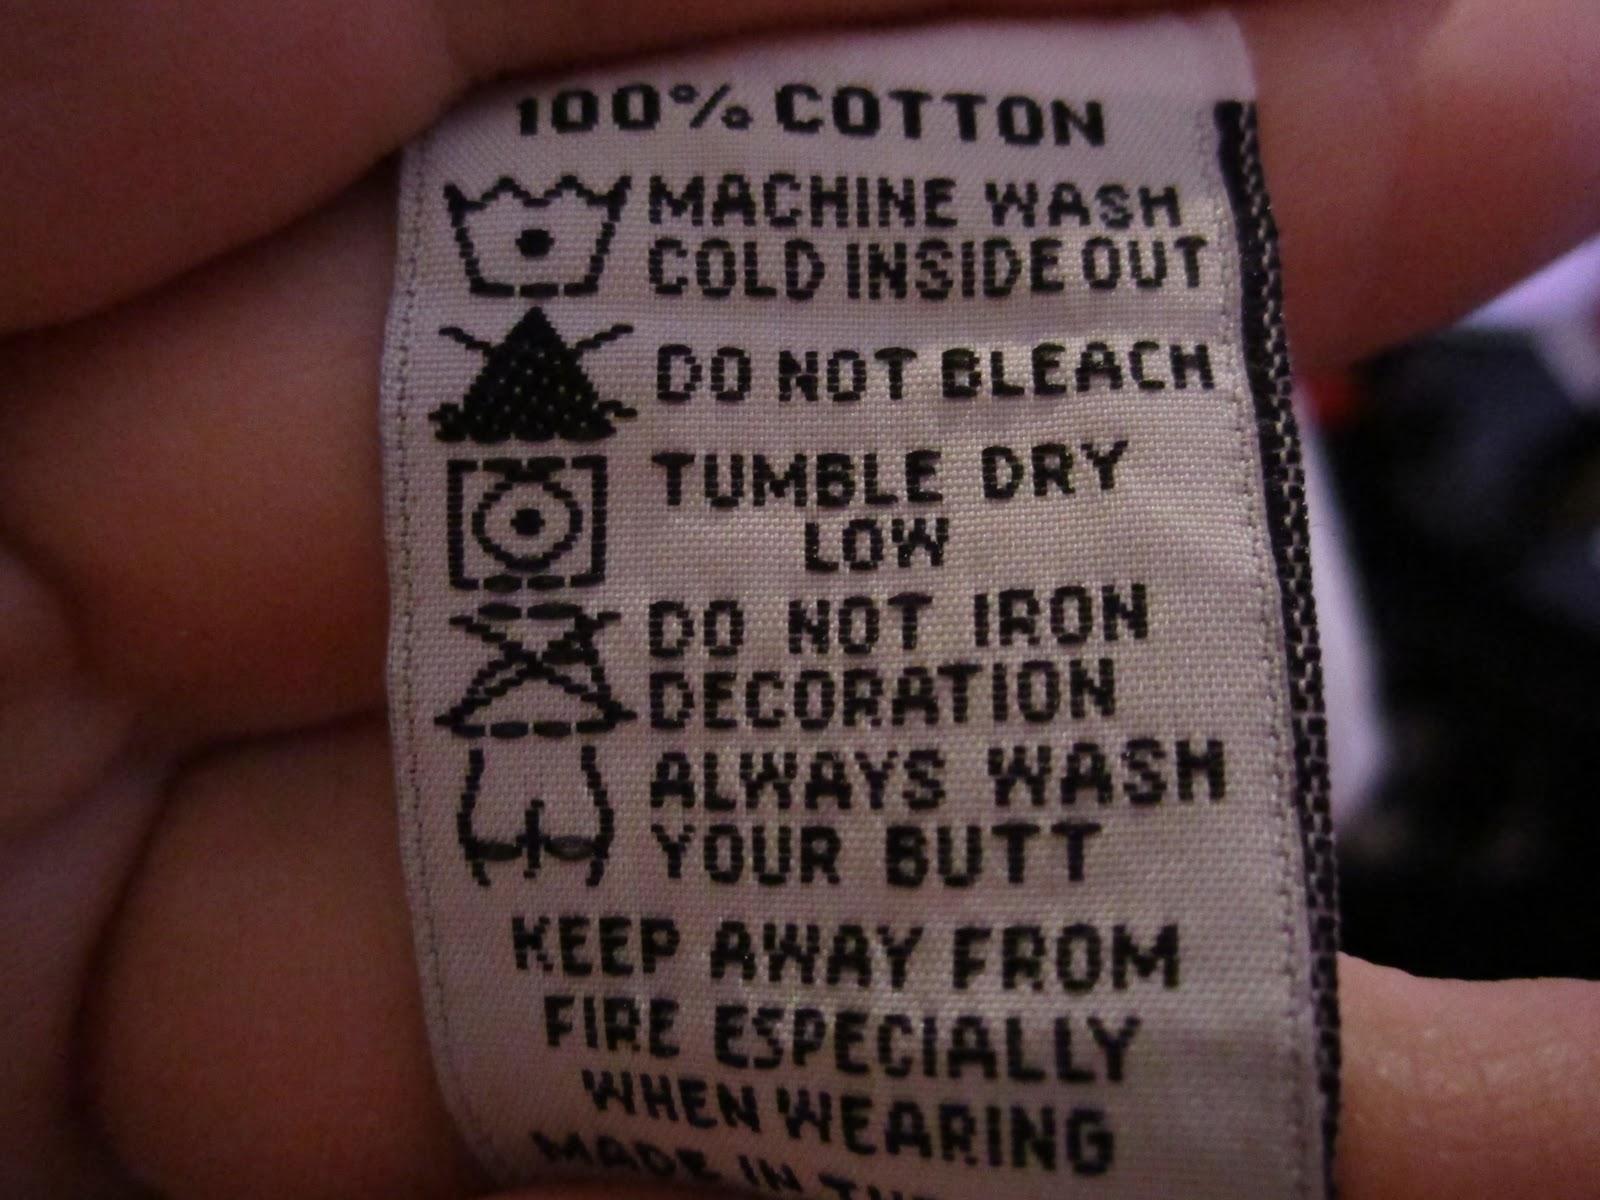 Washing Your Butt 97